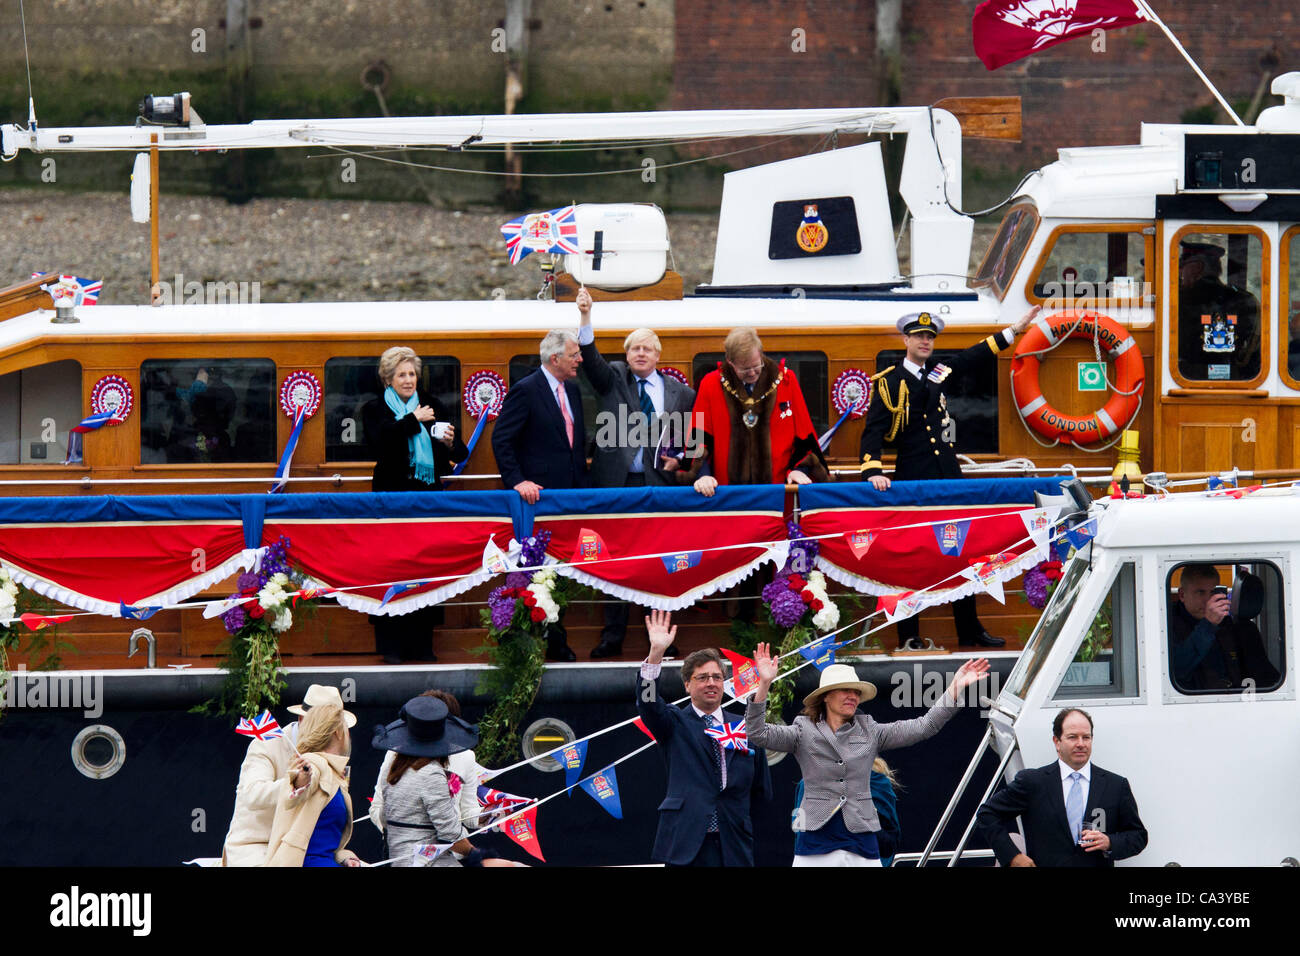 LONDON, UK, 3rd June 2012. Mayor of London Boris Johnson takes part in the diamond jubilee pageant. Stock Photo